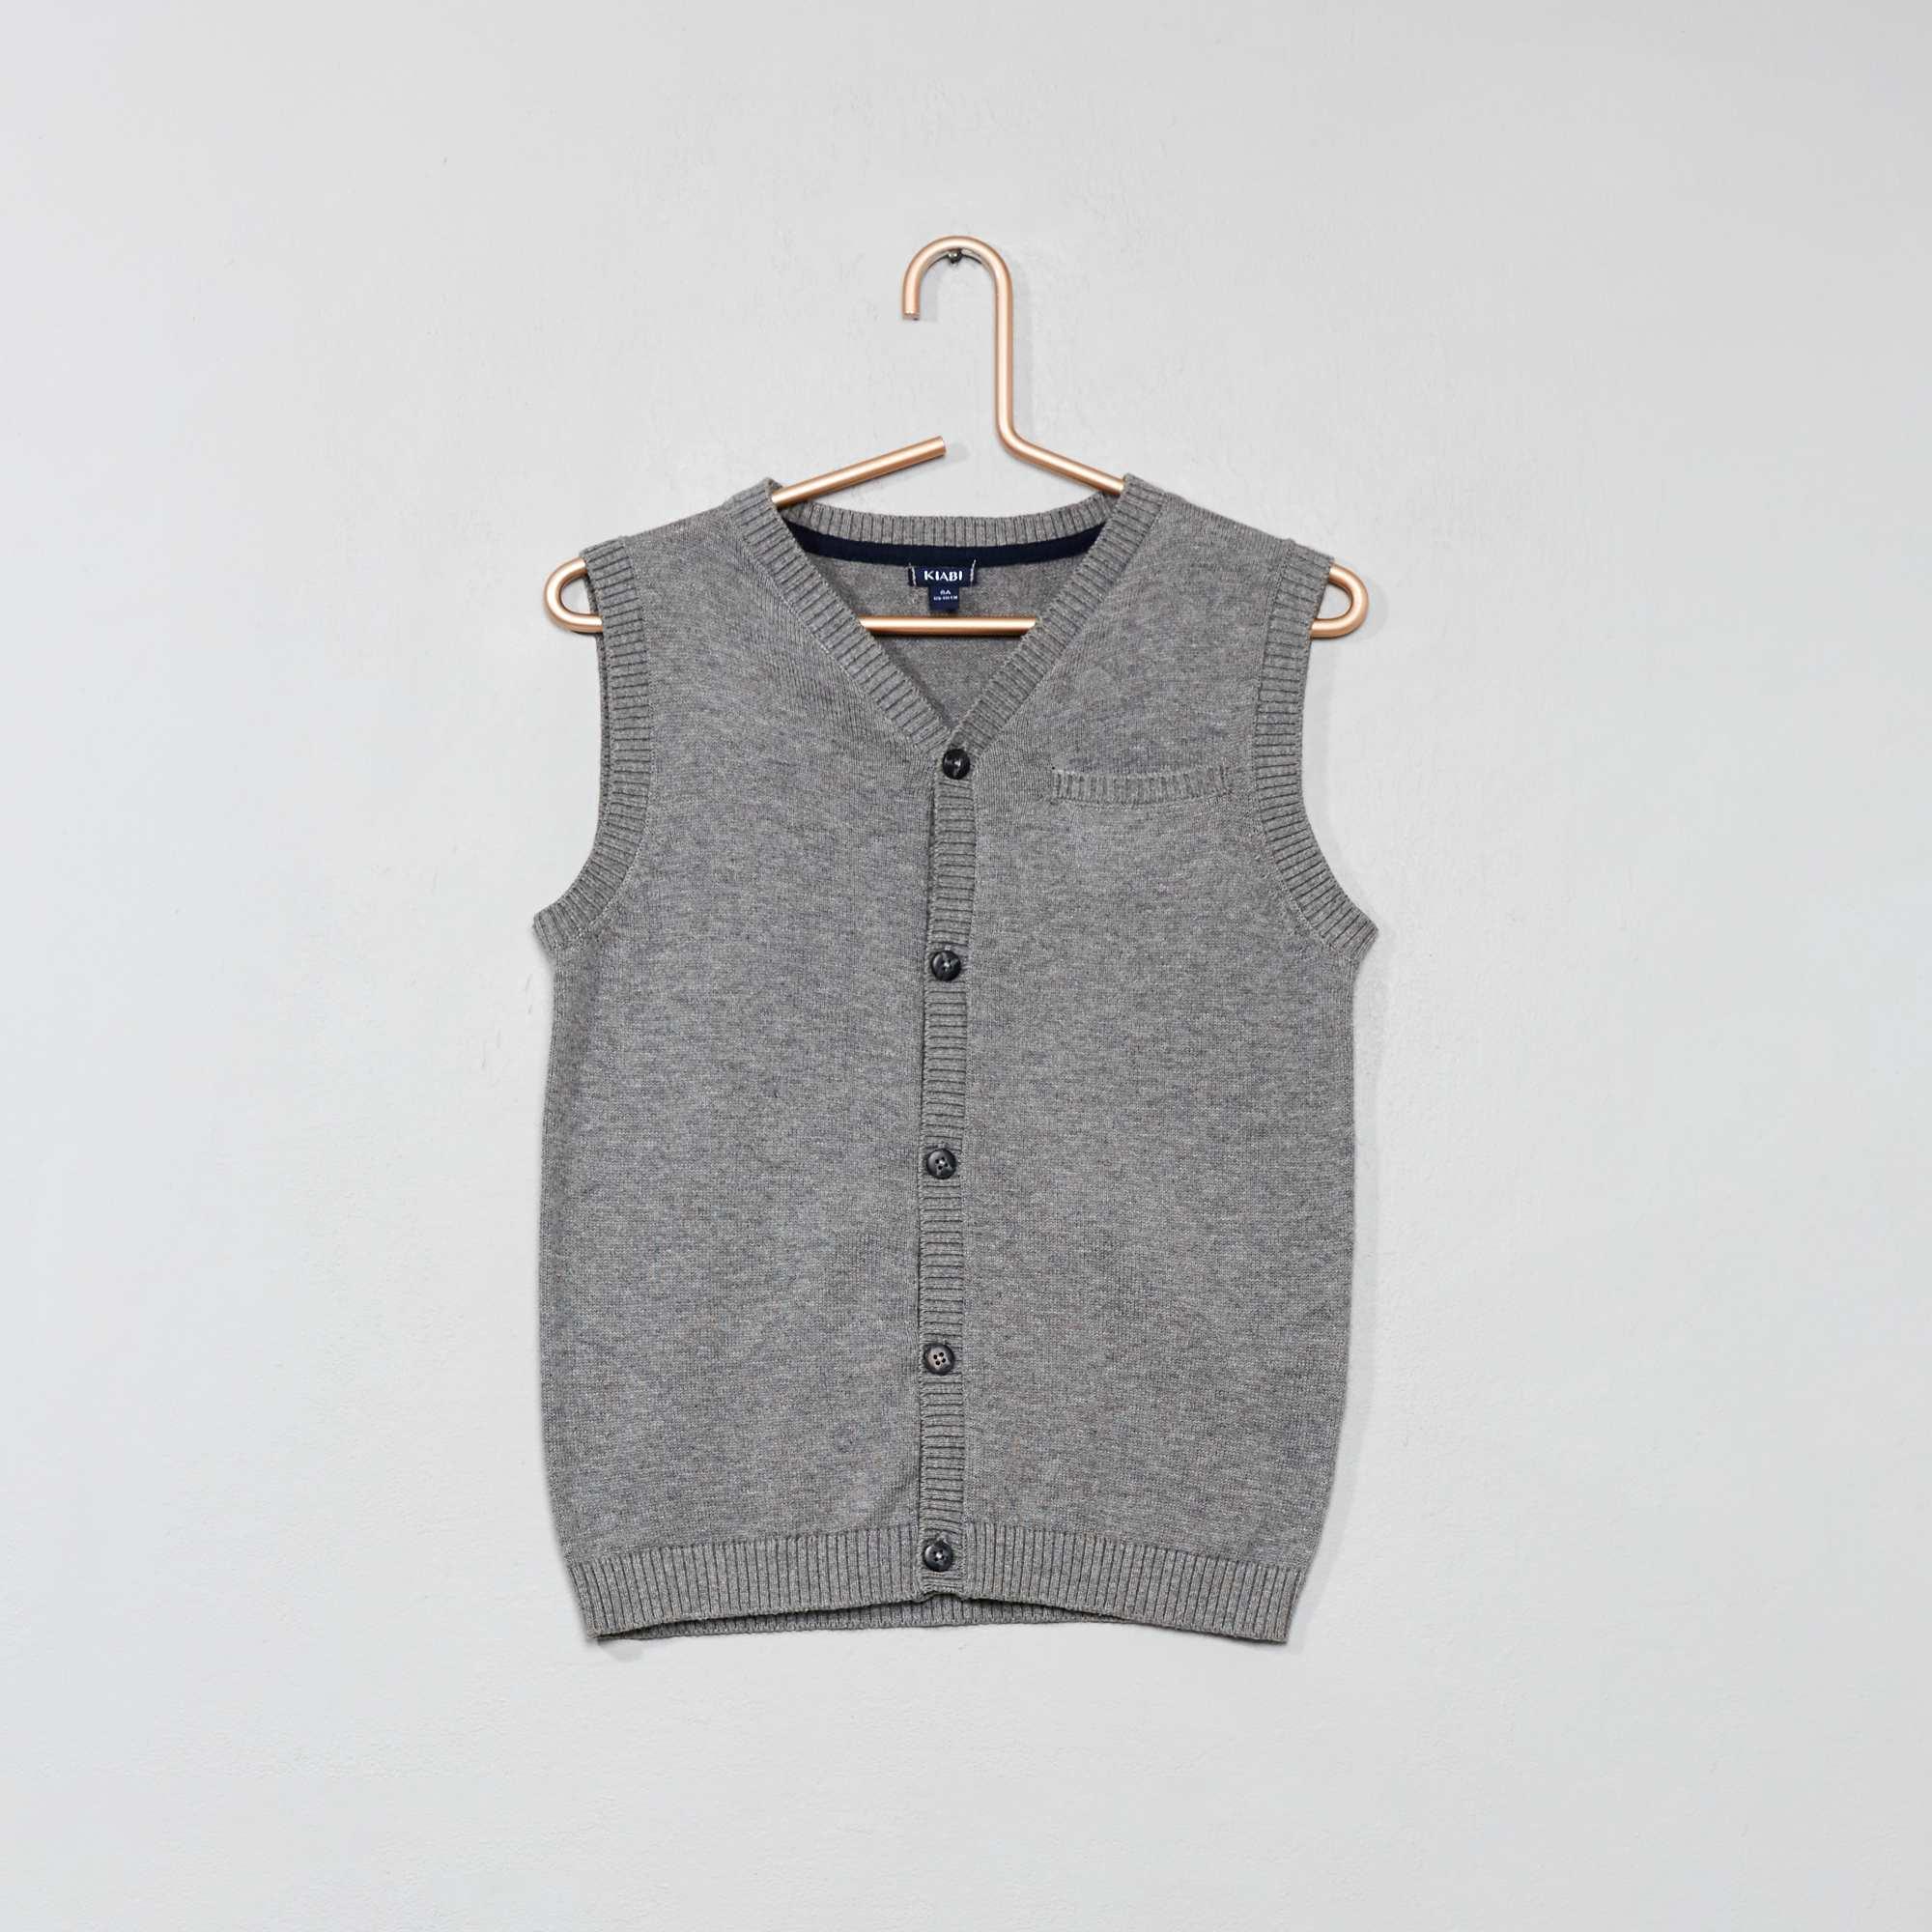 Vest Kinderkleding.Mouwloos Vest Kinderkleding Jongens Grijs Kiabi 8 00